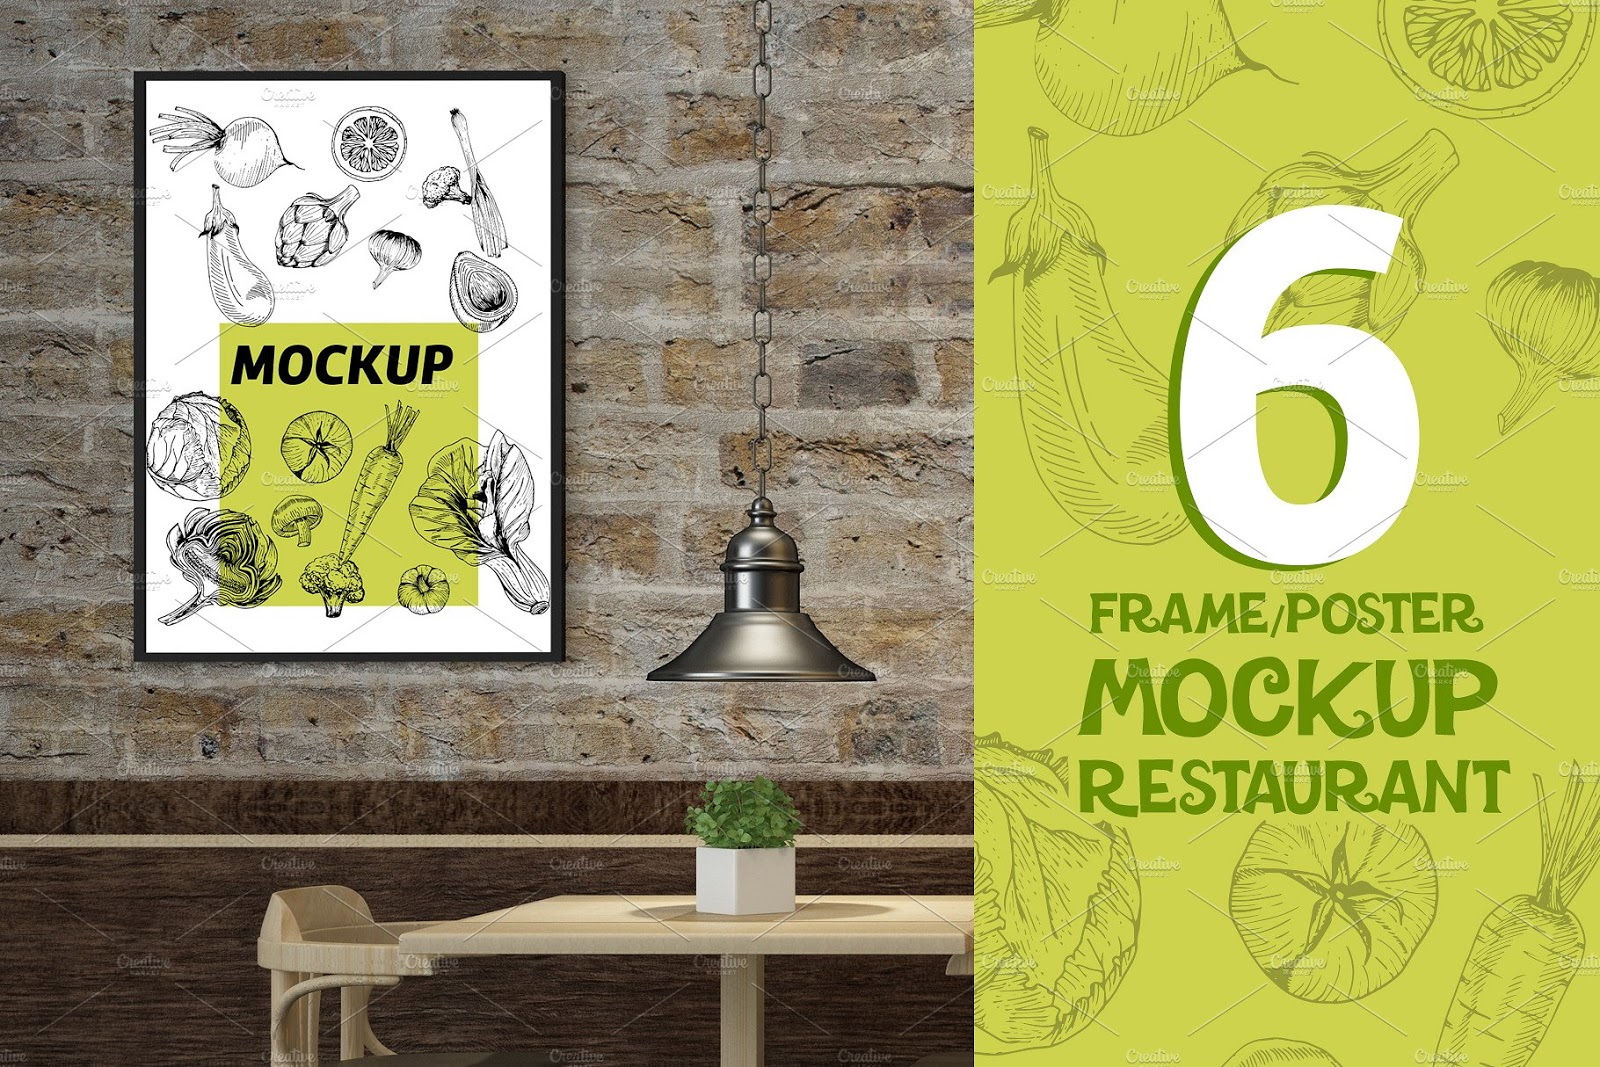 Restaurant Frame Poster Mockups